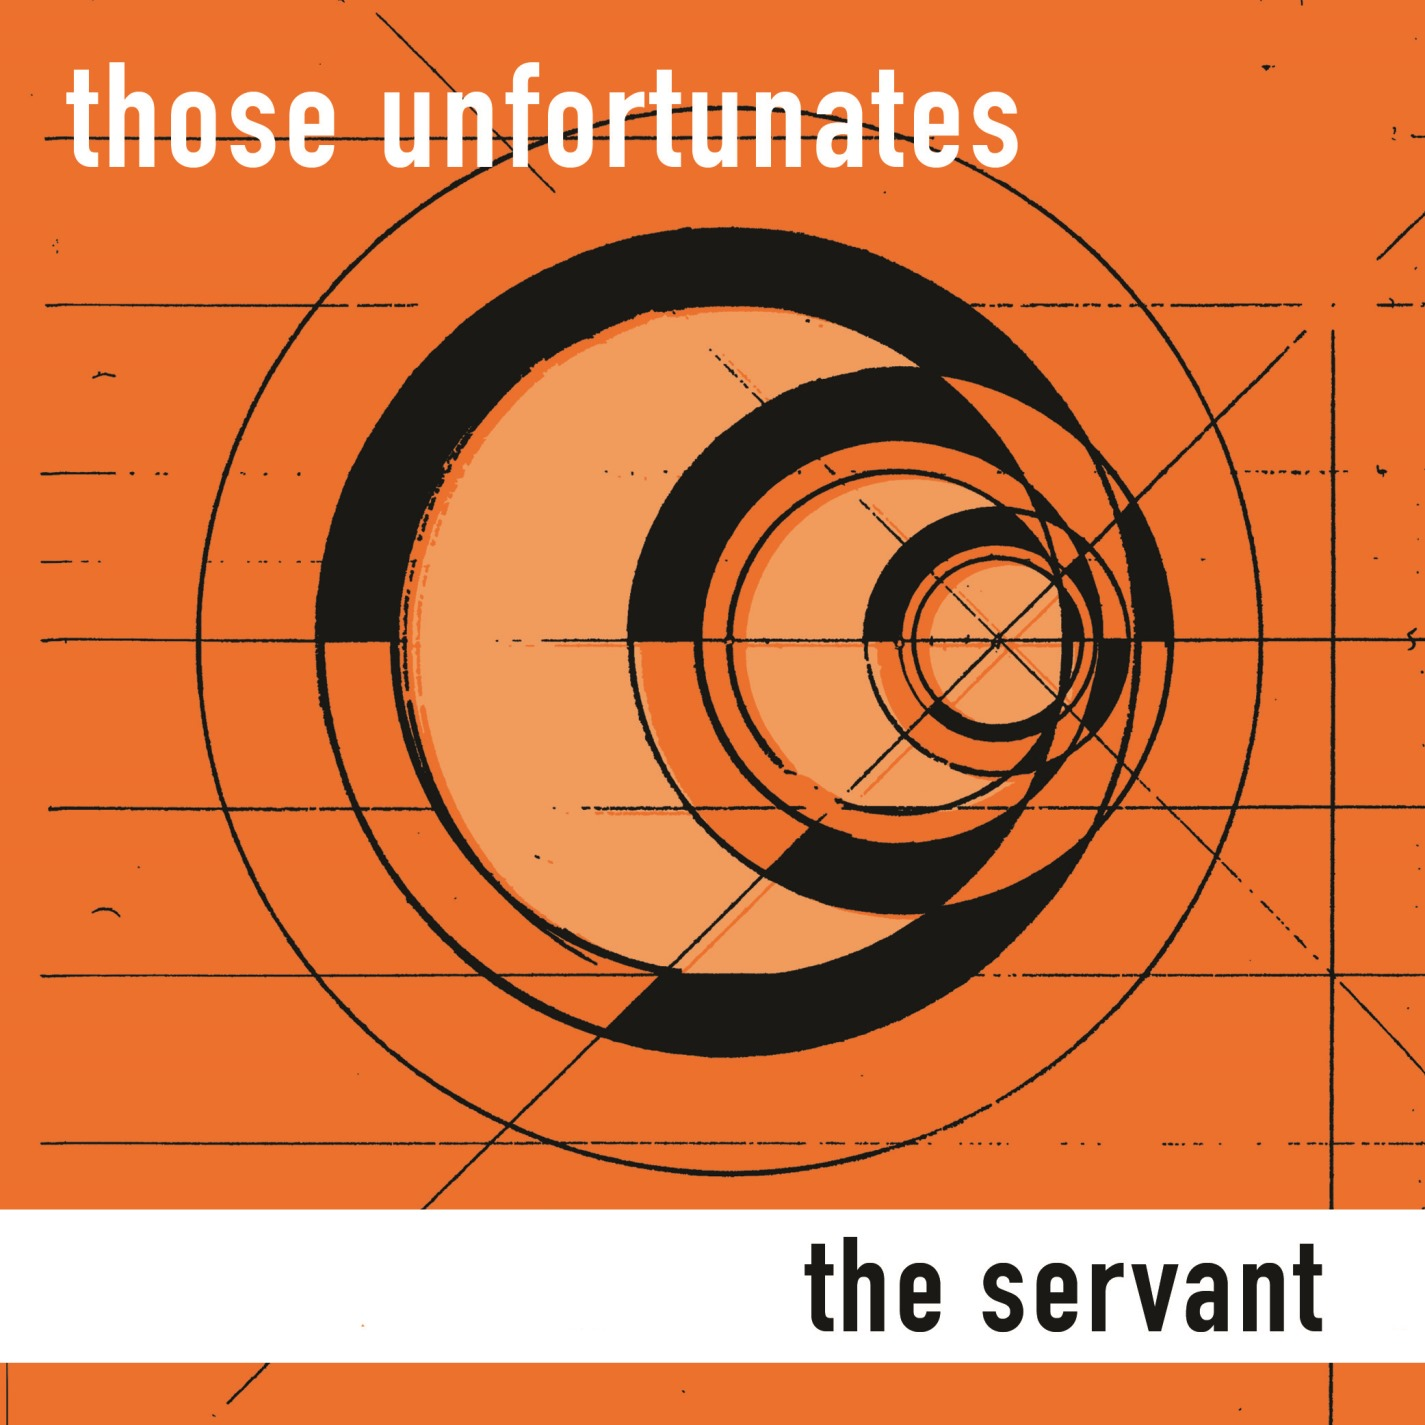 those-unfortunates-the-servant